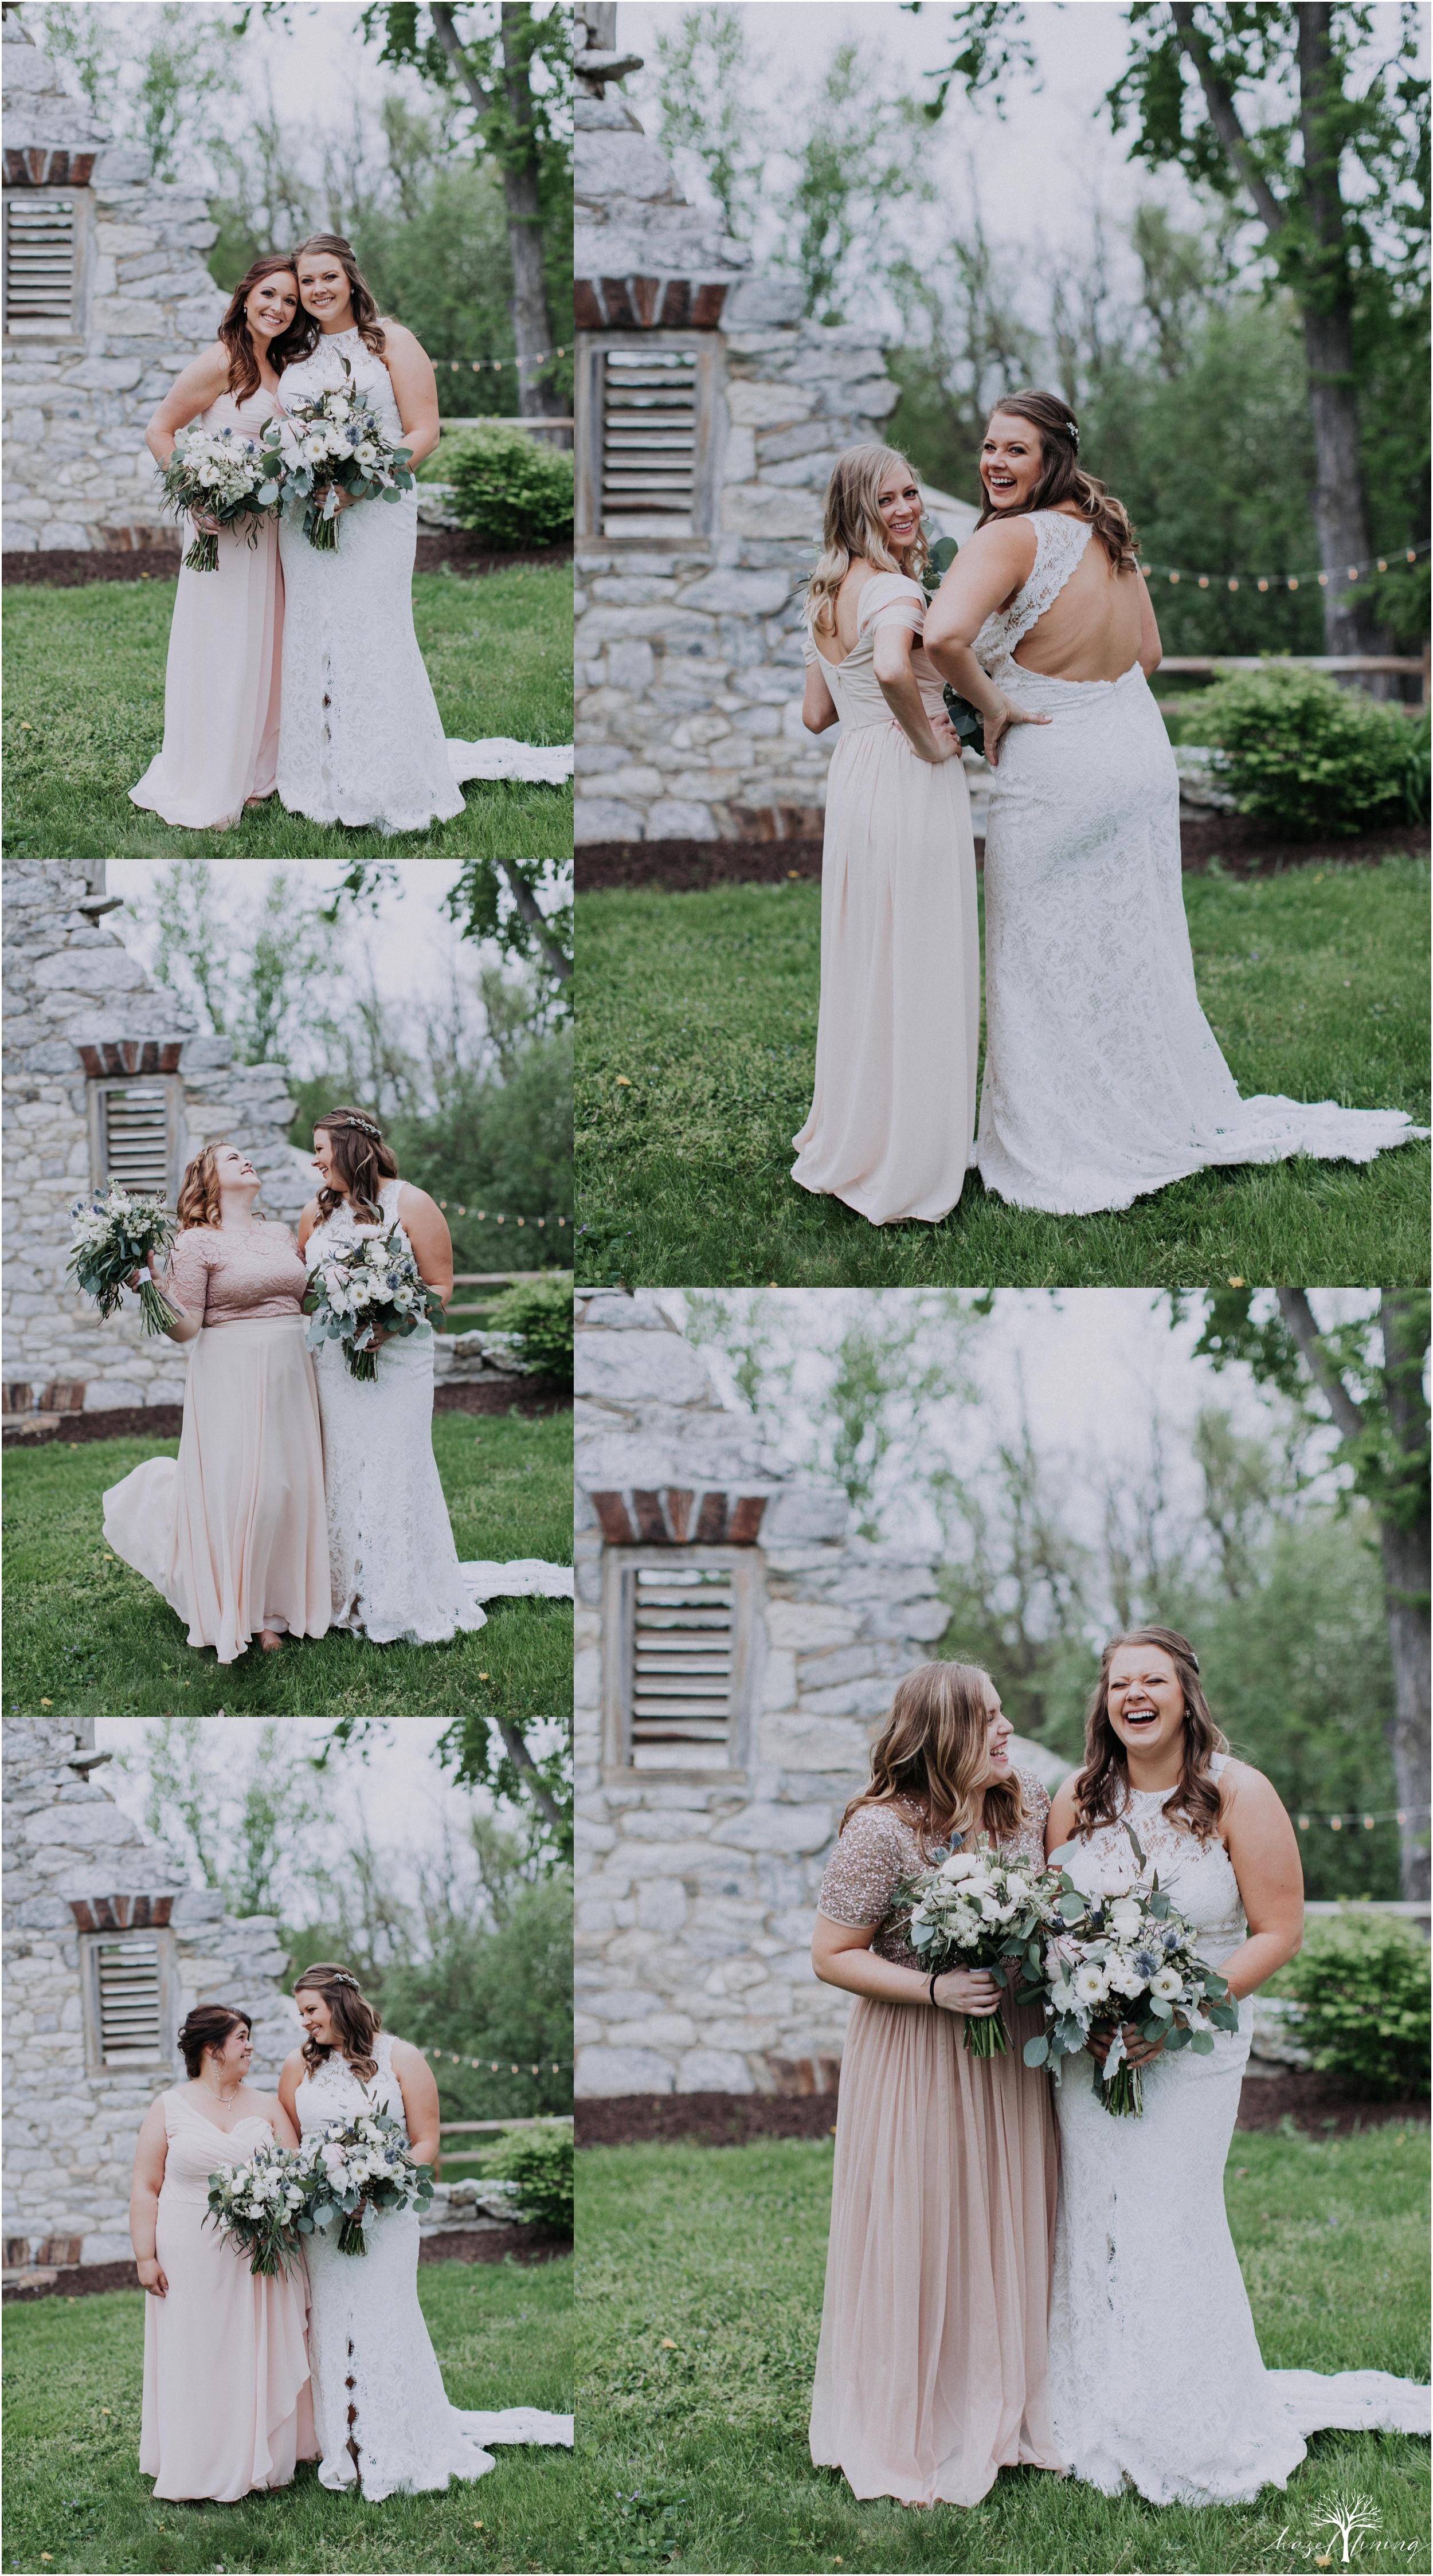 hazel-lining-travel-wedding-elopement-photography-abby-skyler-hunt-the-willis-house-york-pennsylvania-outdoor-estate-wedding_0053.jpg